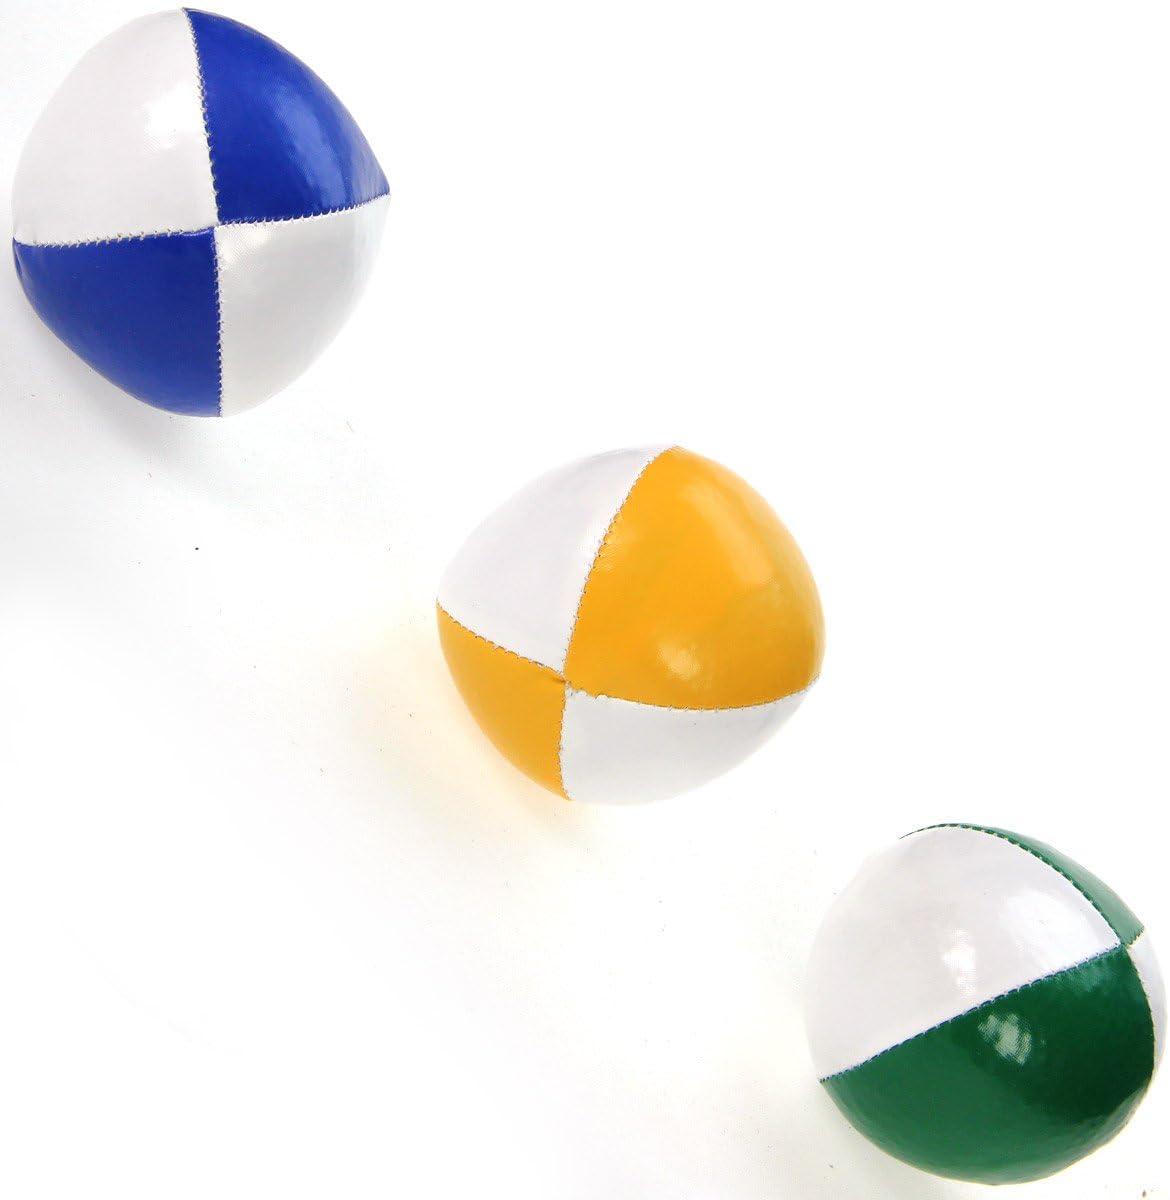 Lot de 3 balles de jonglage Molles 120g Bleu Vert et Jaune